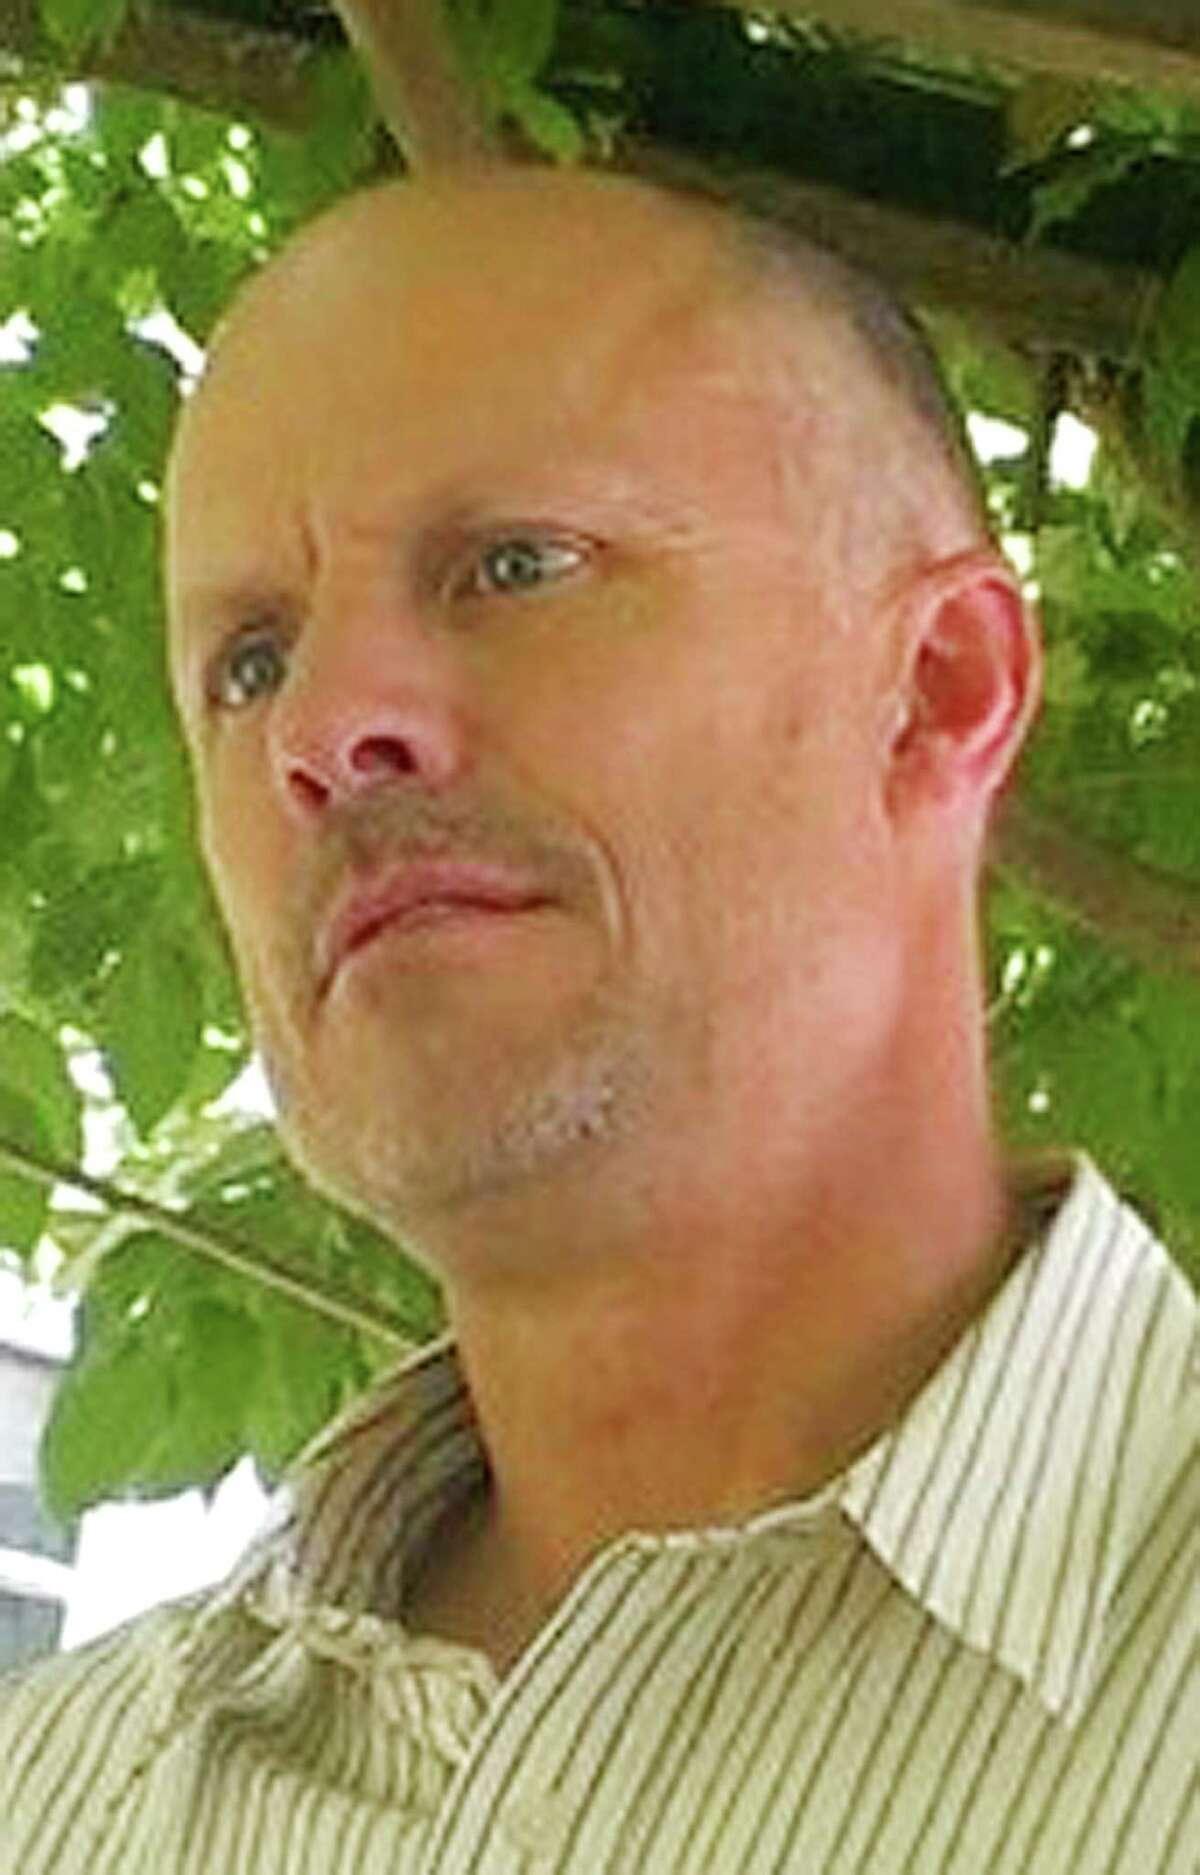 Newtown resident Robert Hoagland has been missing since July 28, 2013.